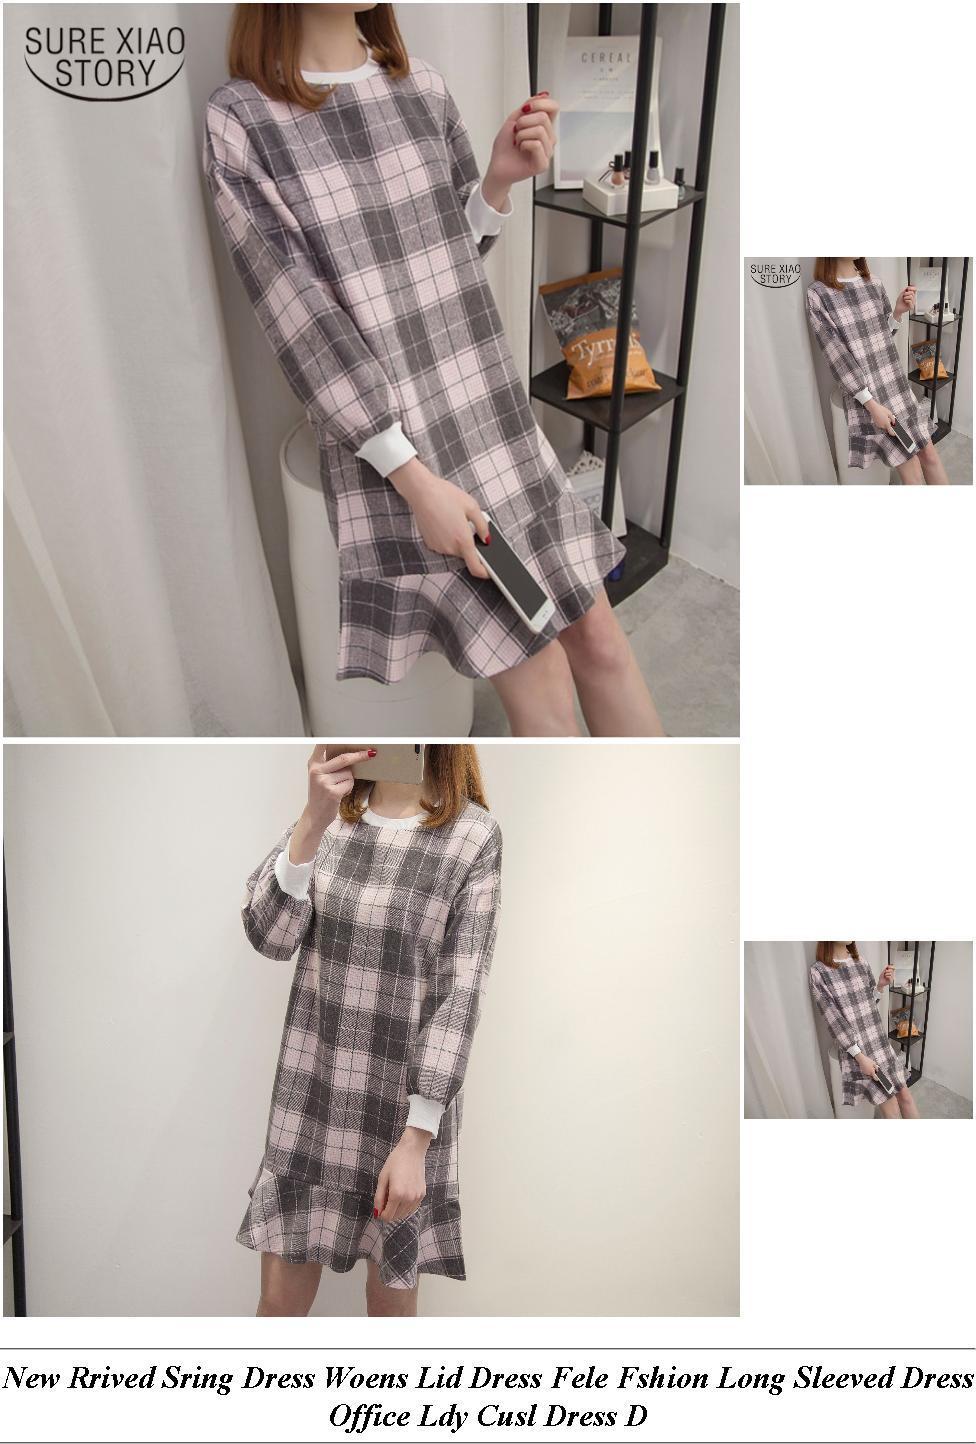 Sweater Dresses At Venus - Online Offer Sale - Linen Tunic Dress Uk